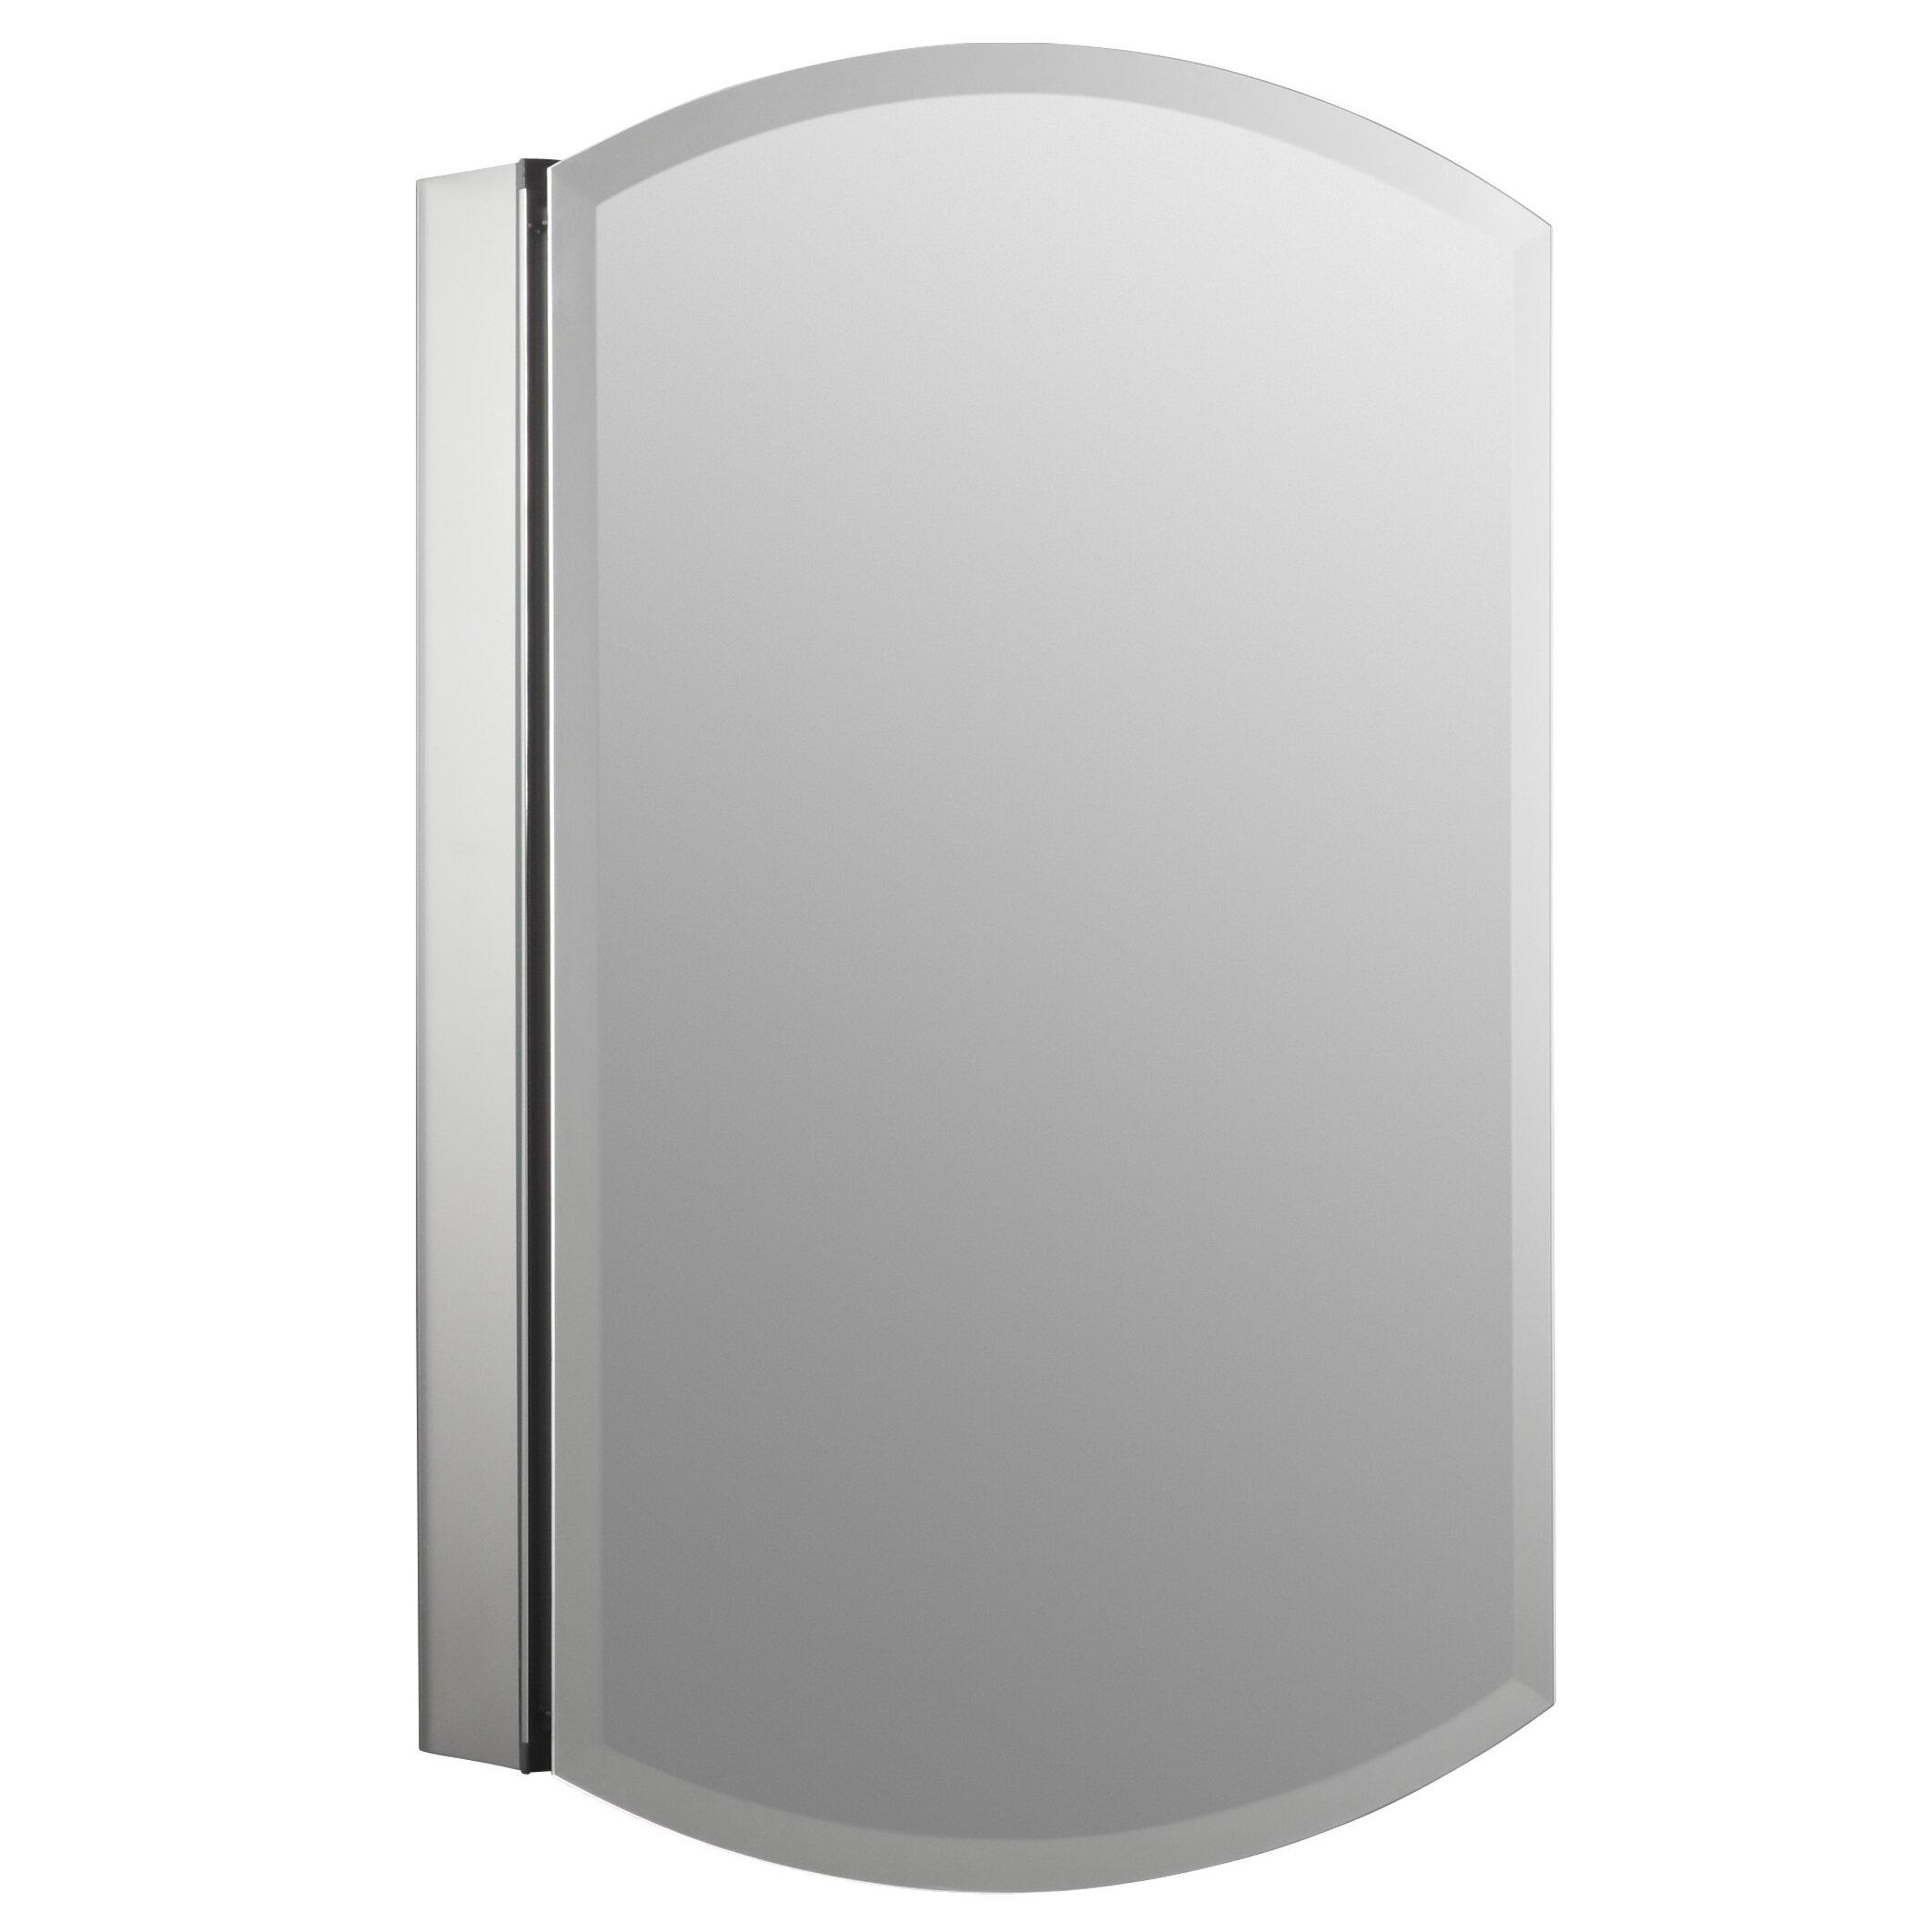 18 X 24 Medicine Cabinet Archer 20 X 31 Aluminum Wall Mount Medicine Cabinet With